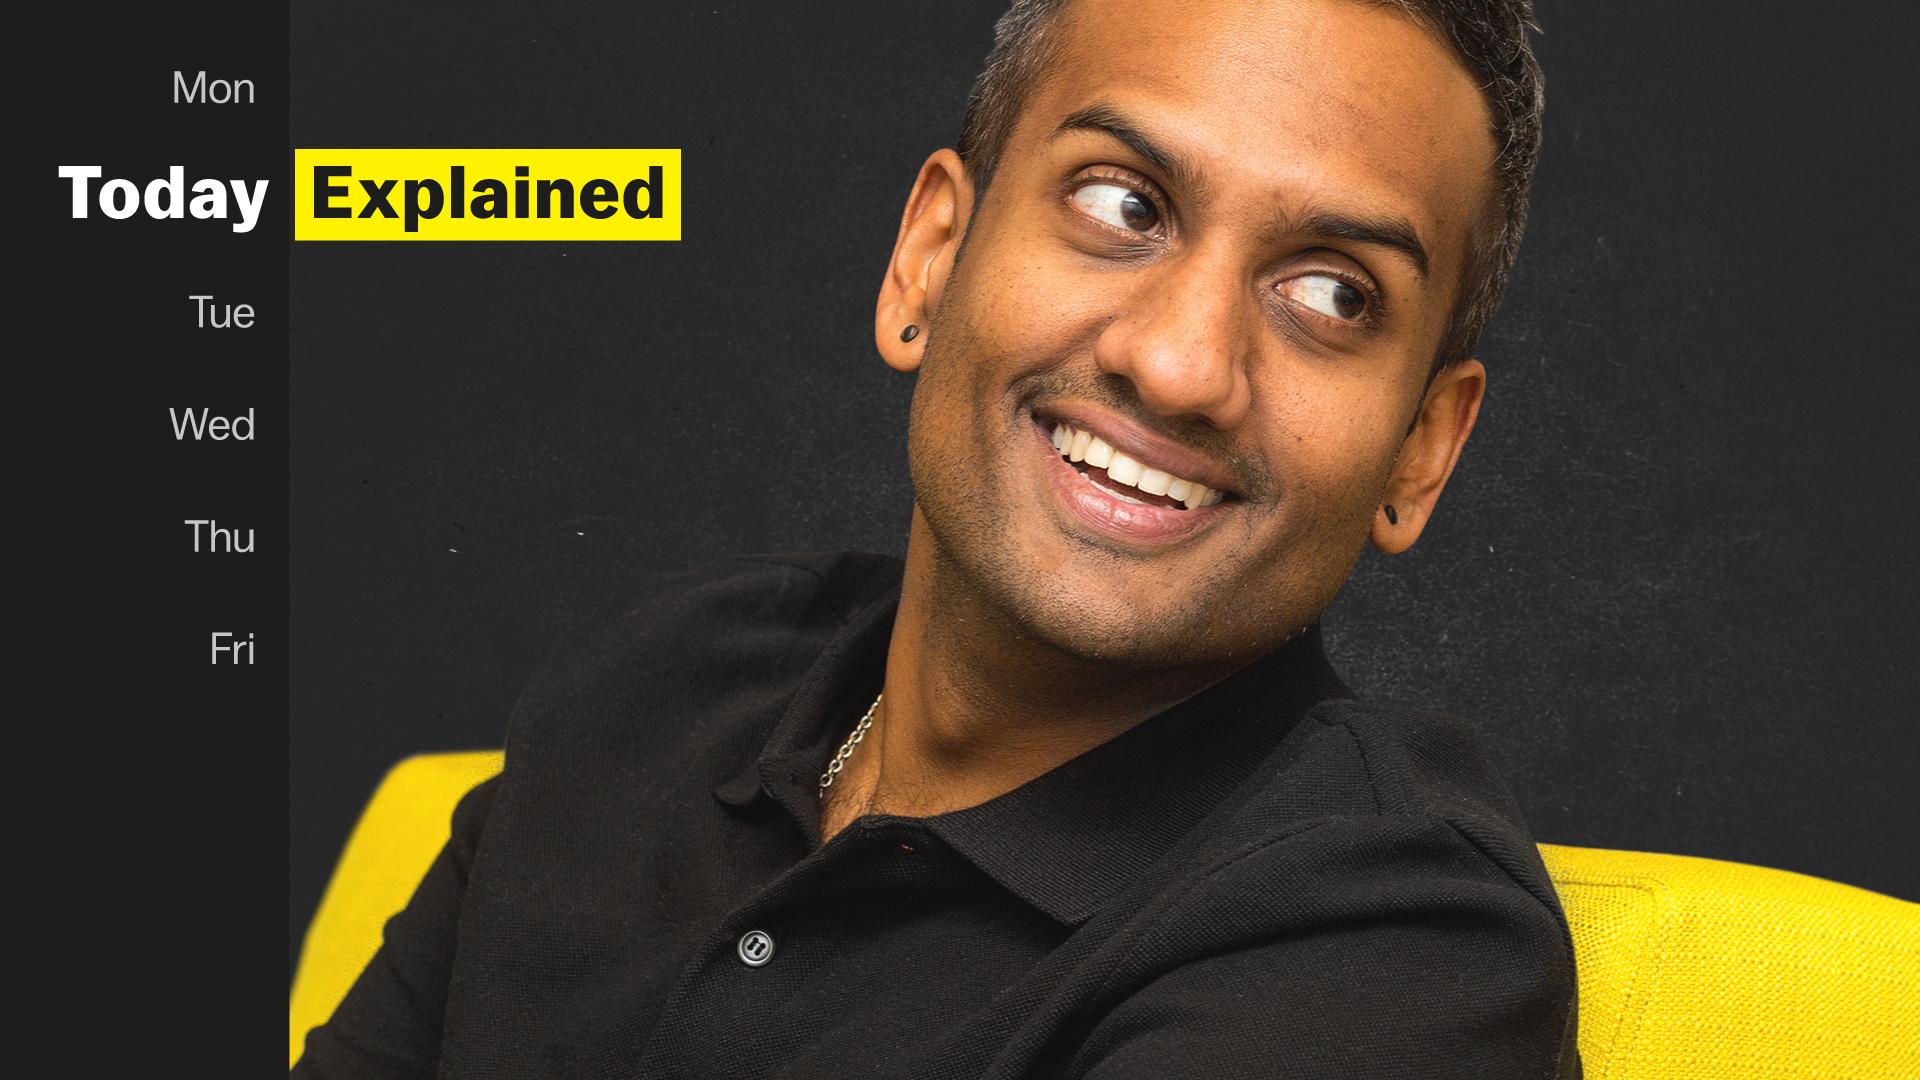 Today, Explained host Sean Rameswaram